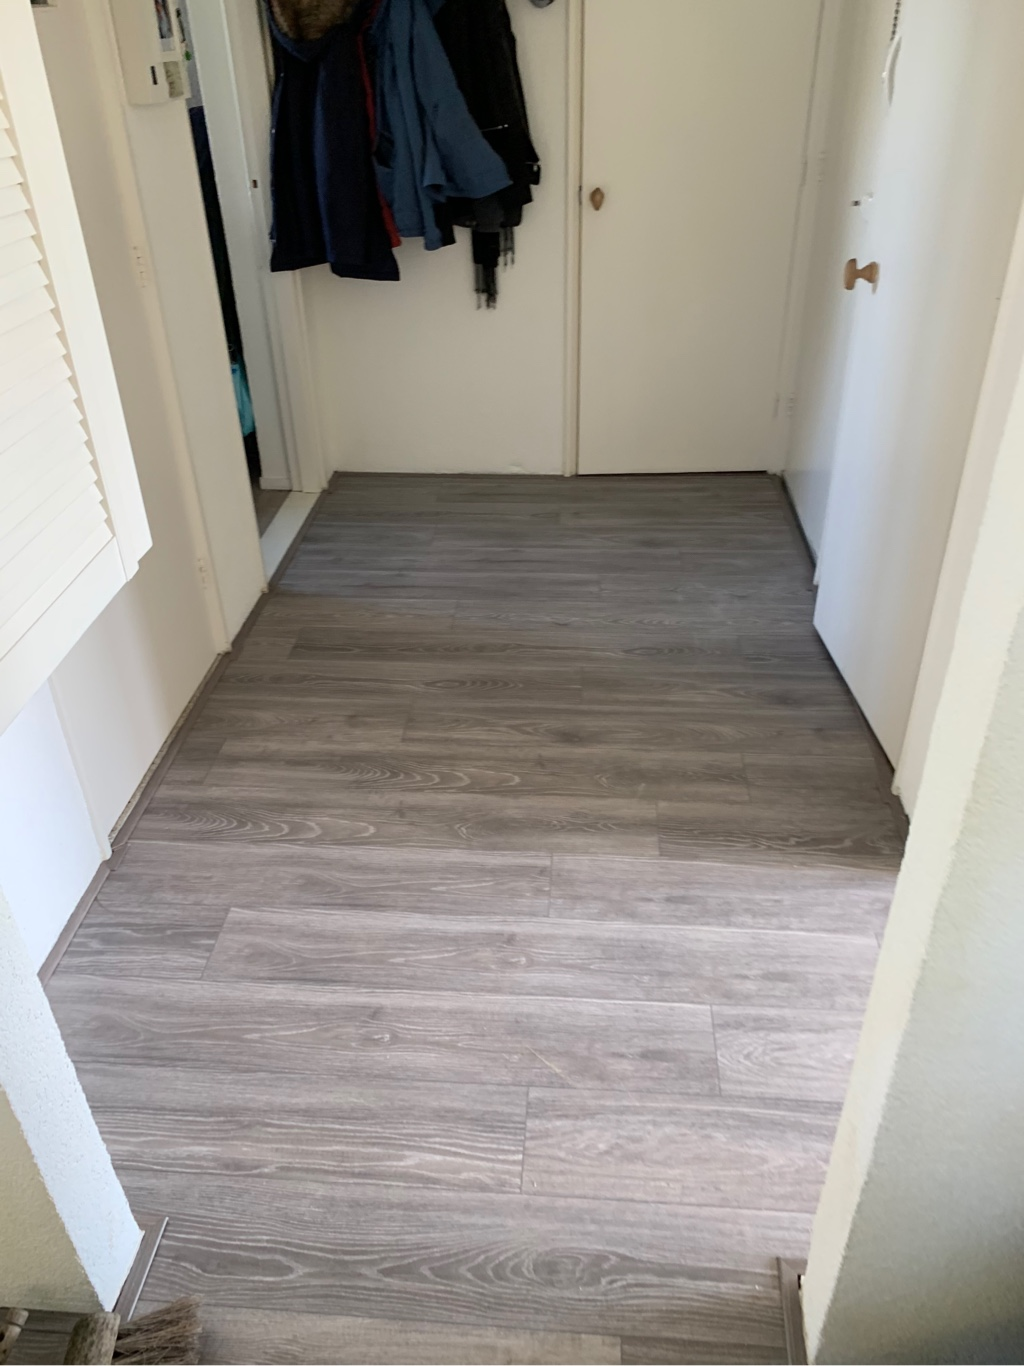 55 m² Steen Grijs Eiken te Weesp